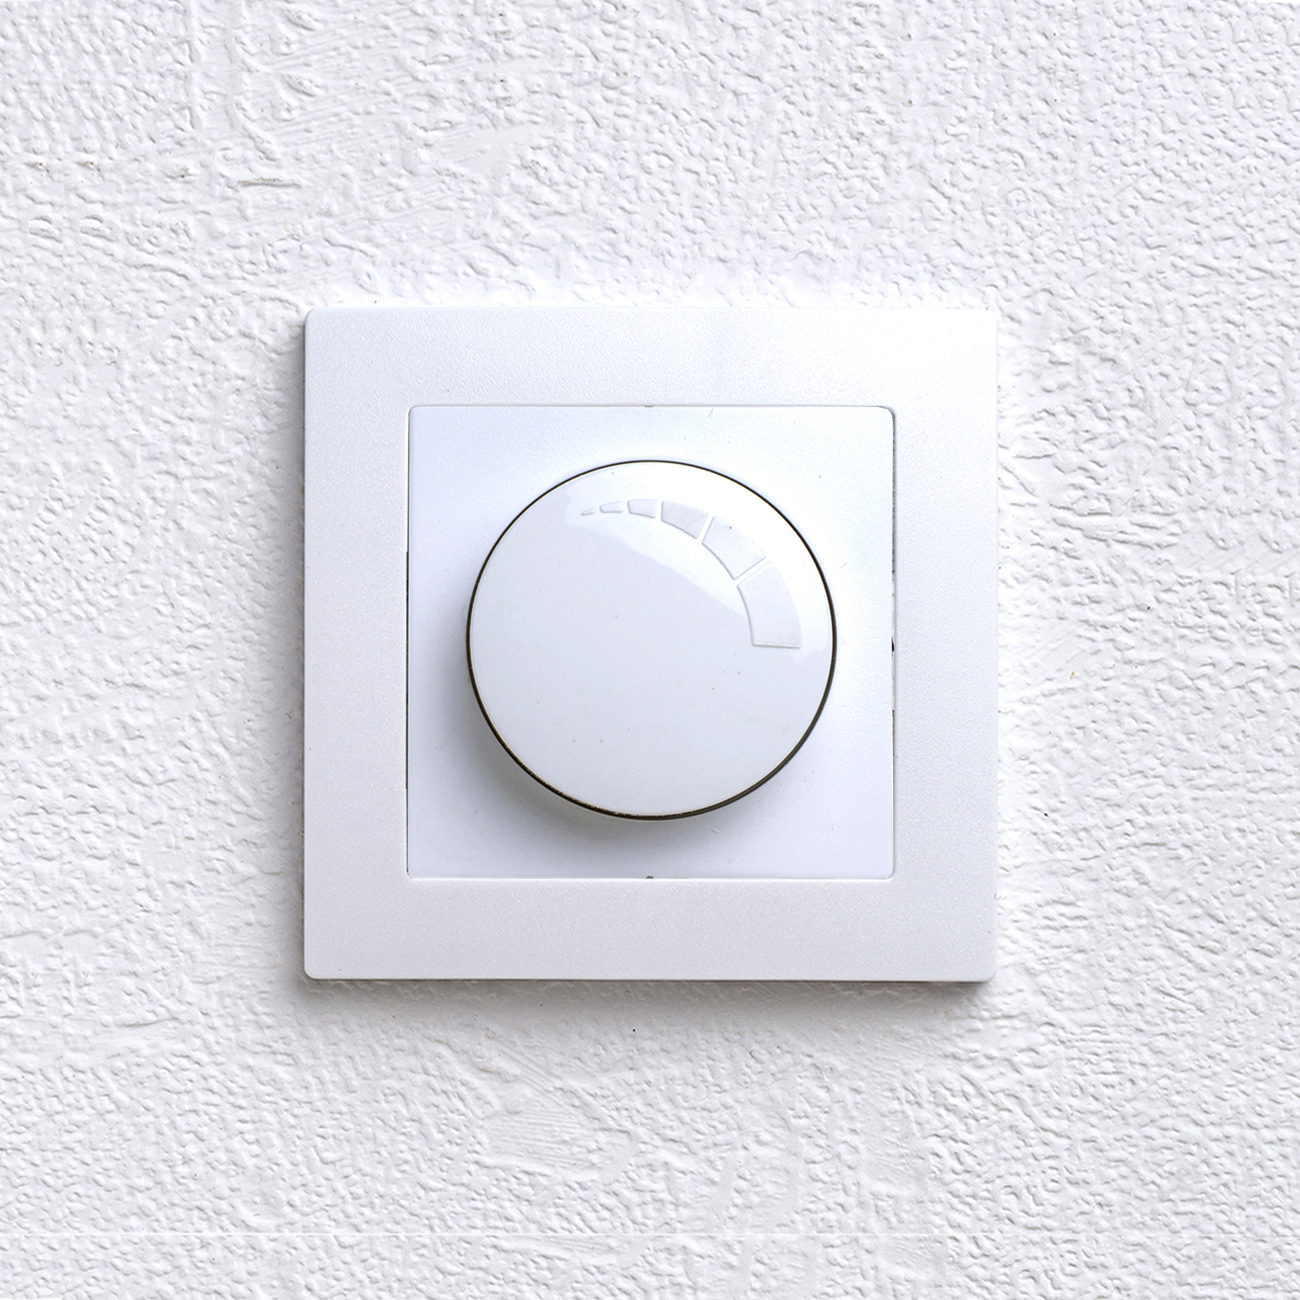 levina 1x led dimmer 7 110 watt wei inkl rahmen leuchten zubeh r elektroartikel. Black Bedroom Furniture Sets. Home Design Ideas